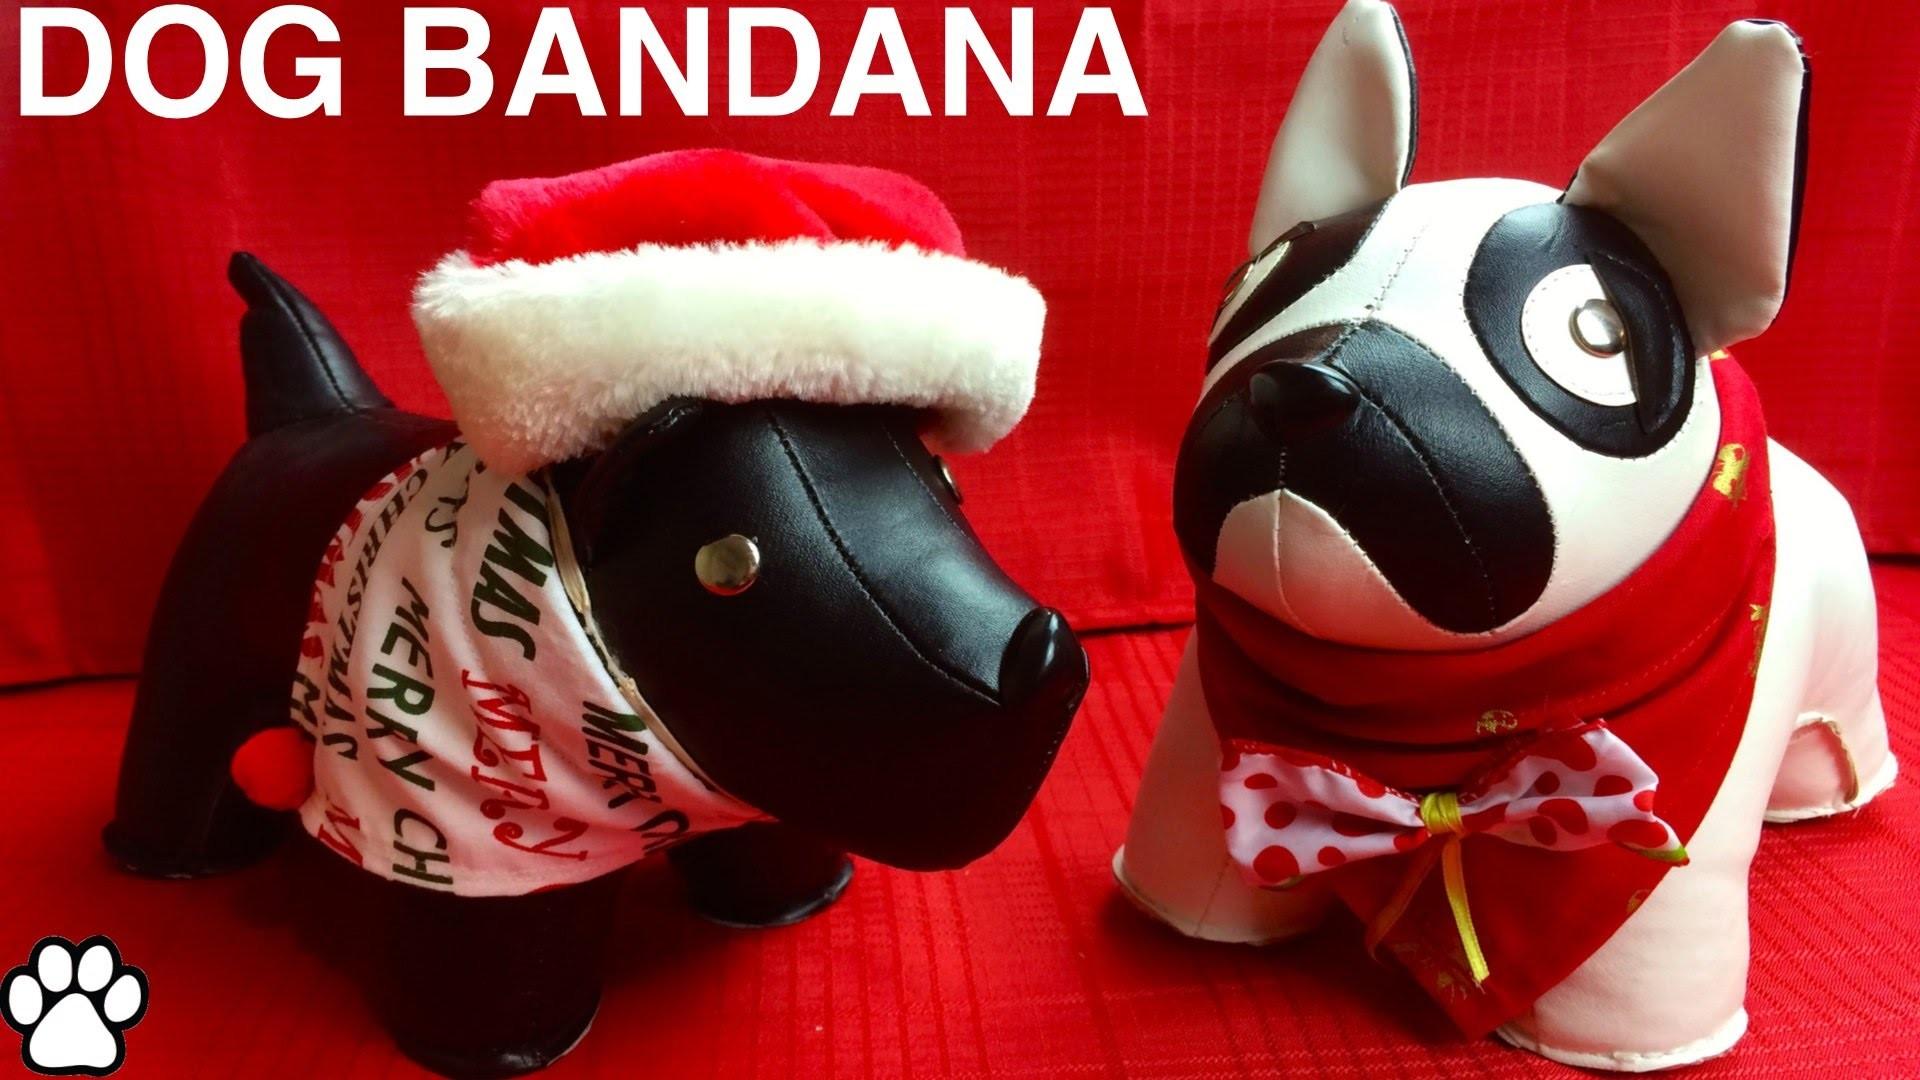 CHRISTMAS DOG BANDANA - XMAS FESTIVE SCARF - DIY Dog Craft by Cooking For Dogs